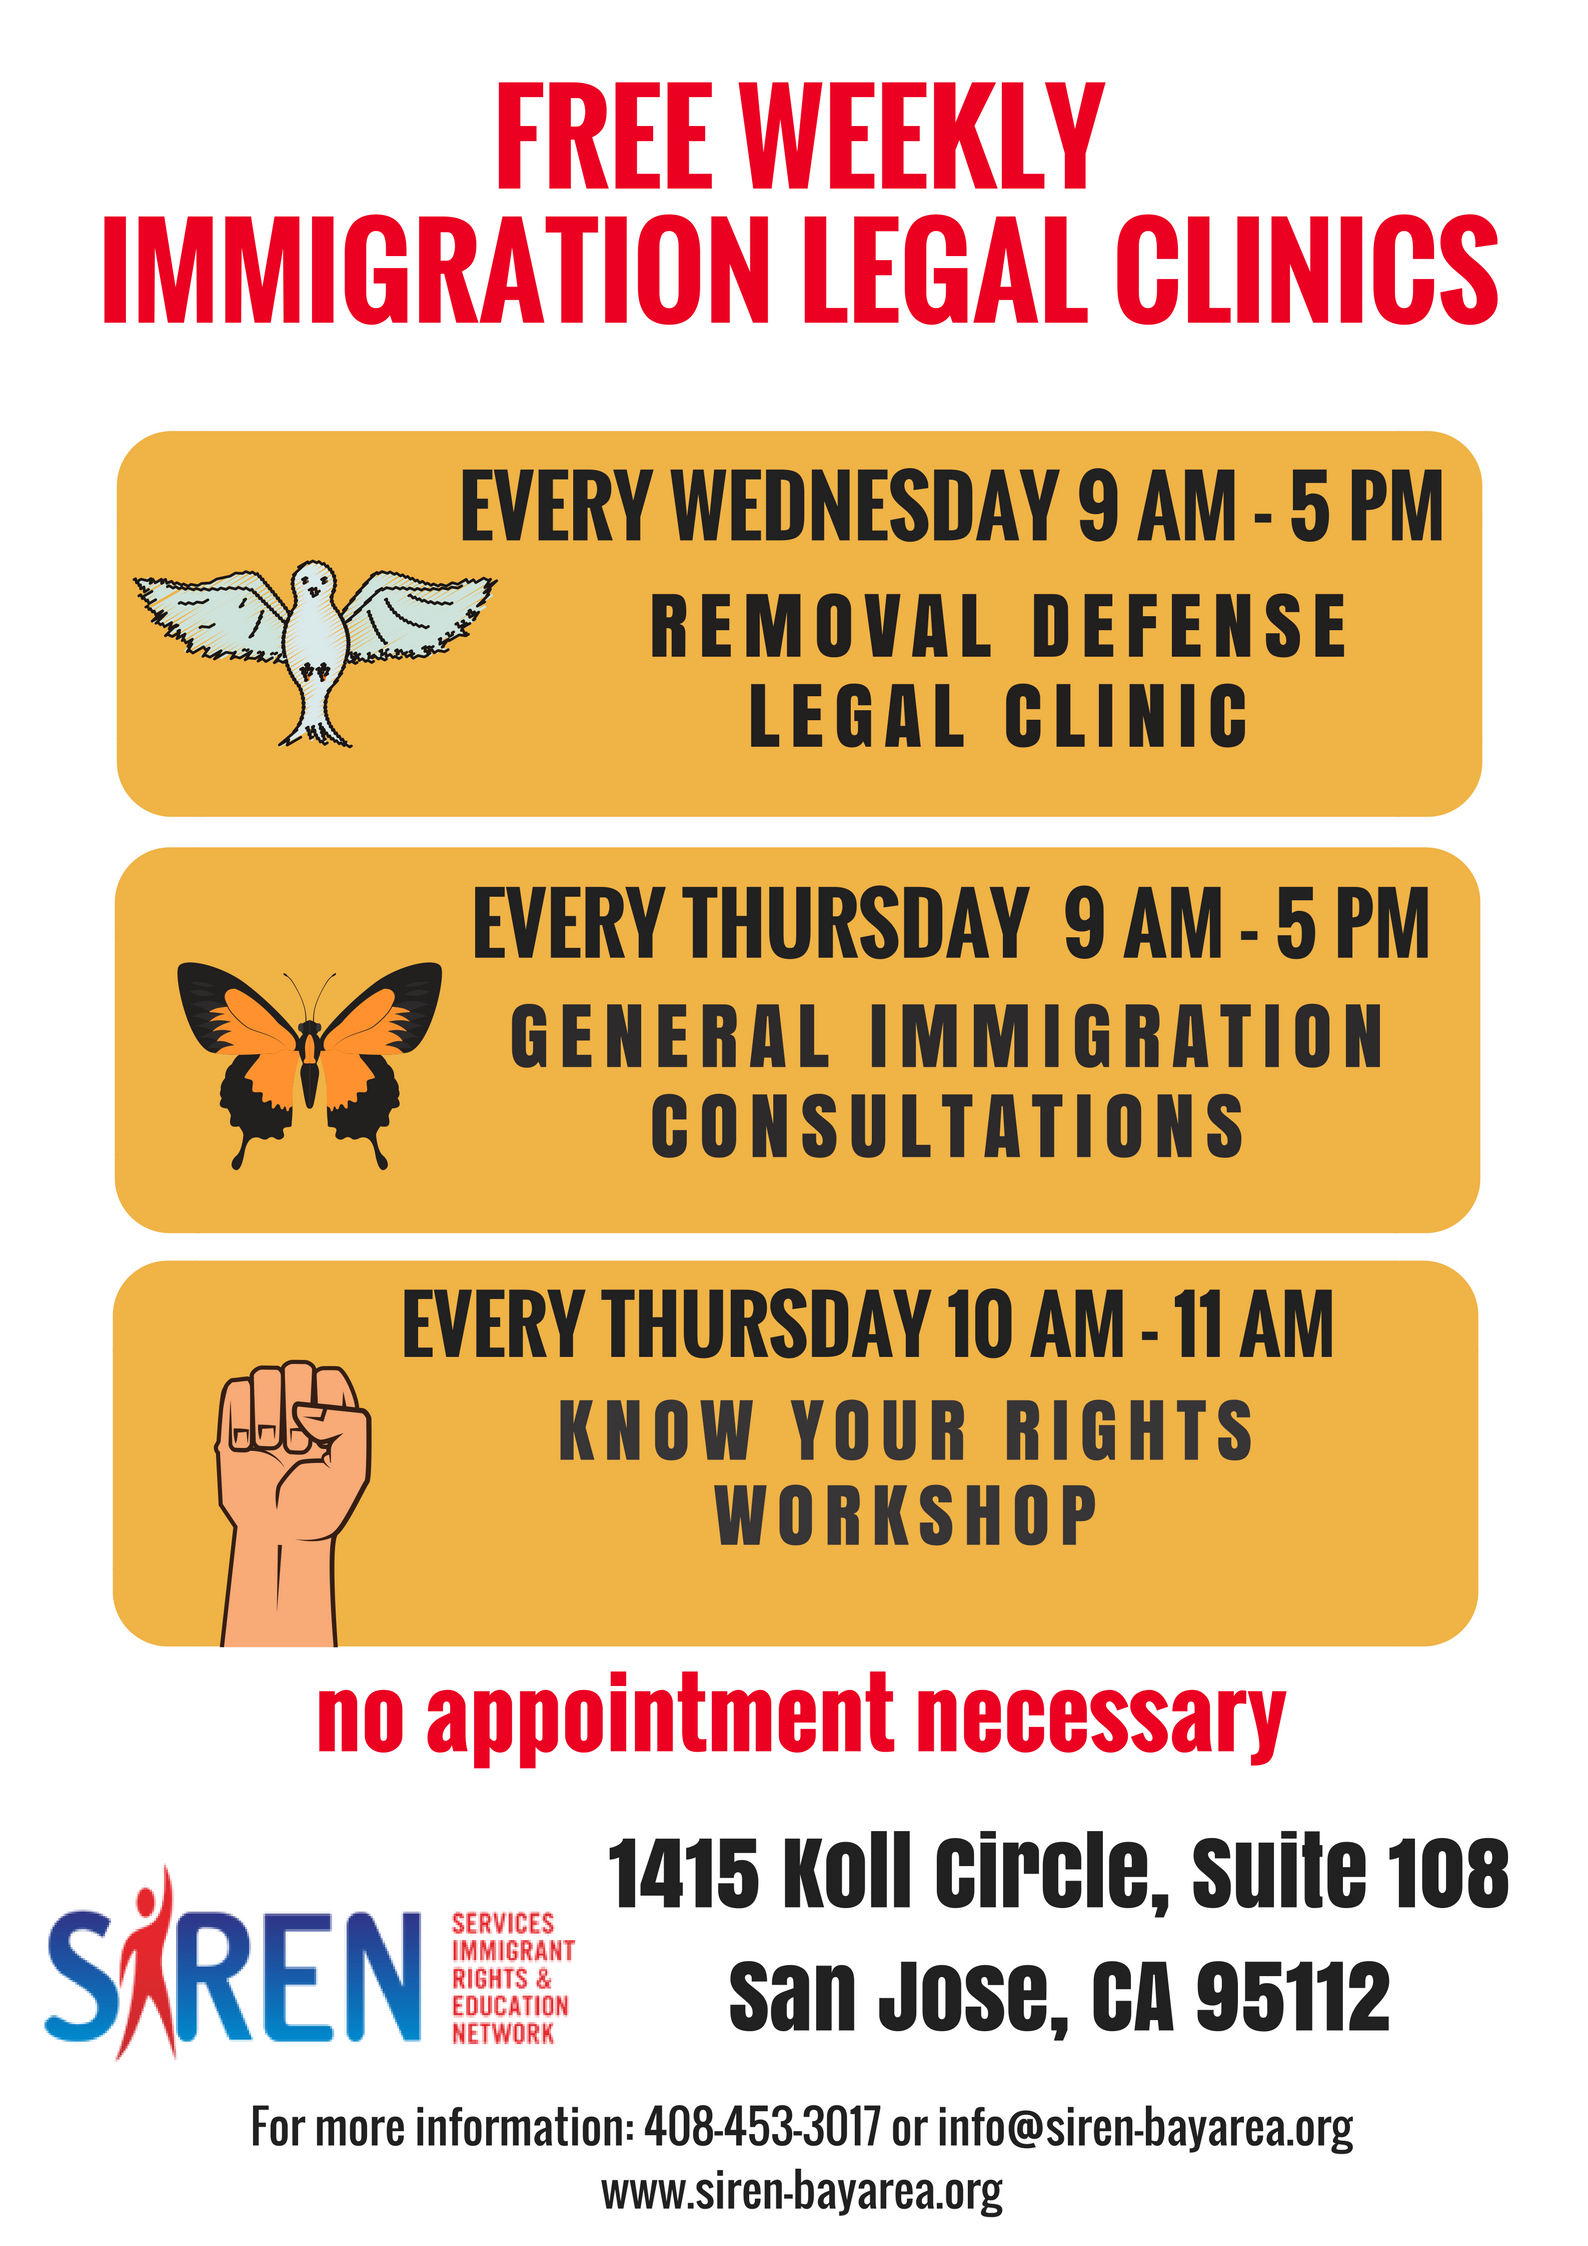 immigration-free-legal-clinics-SIREN.png